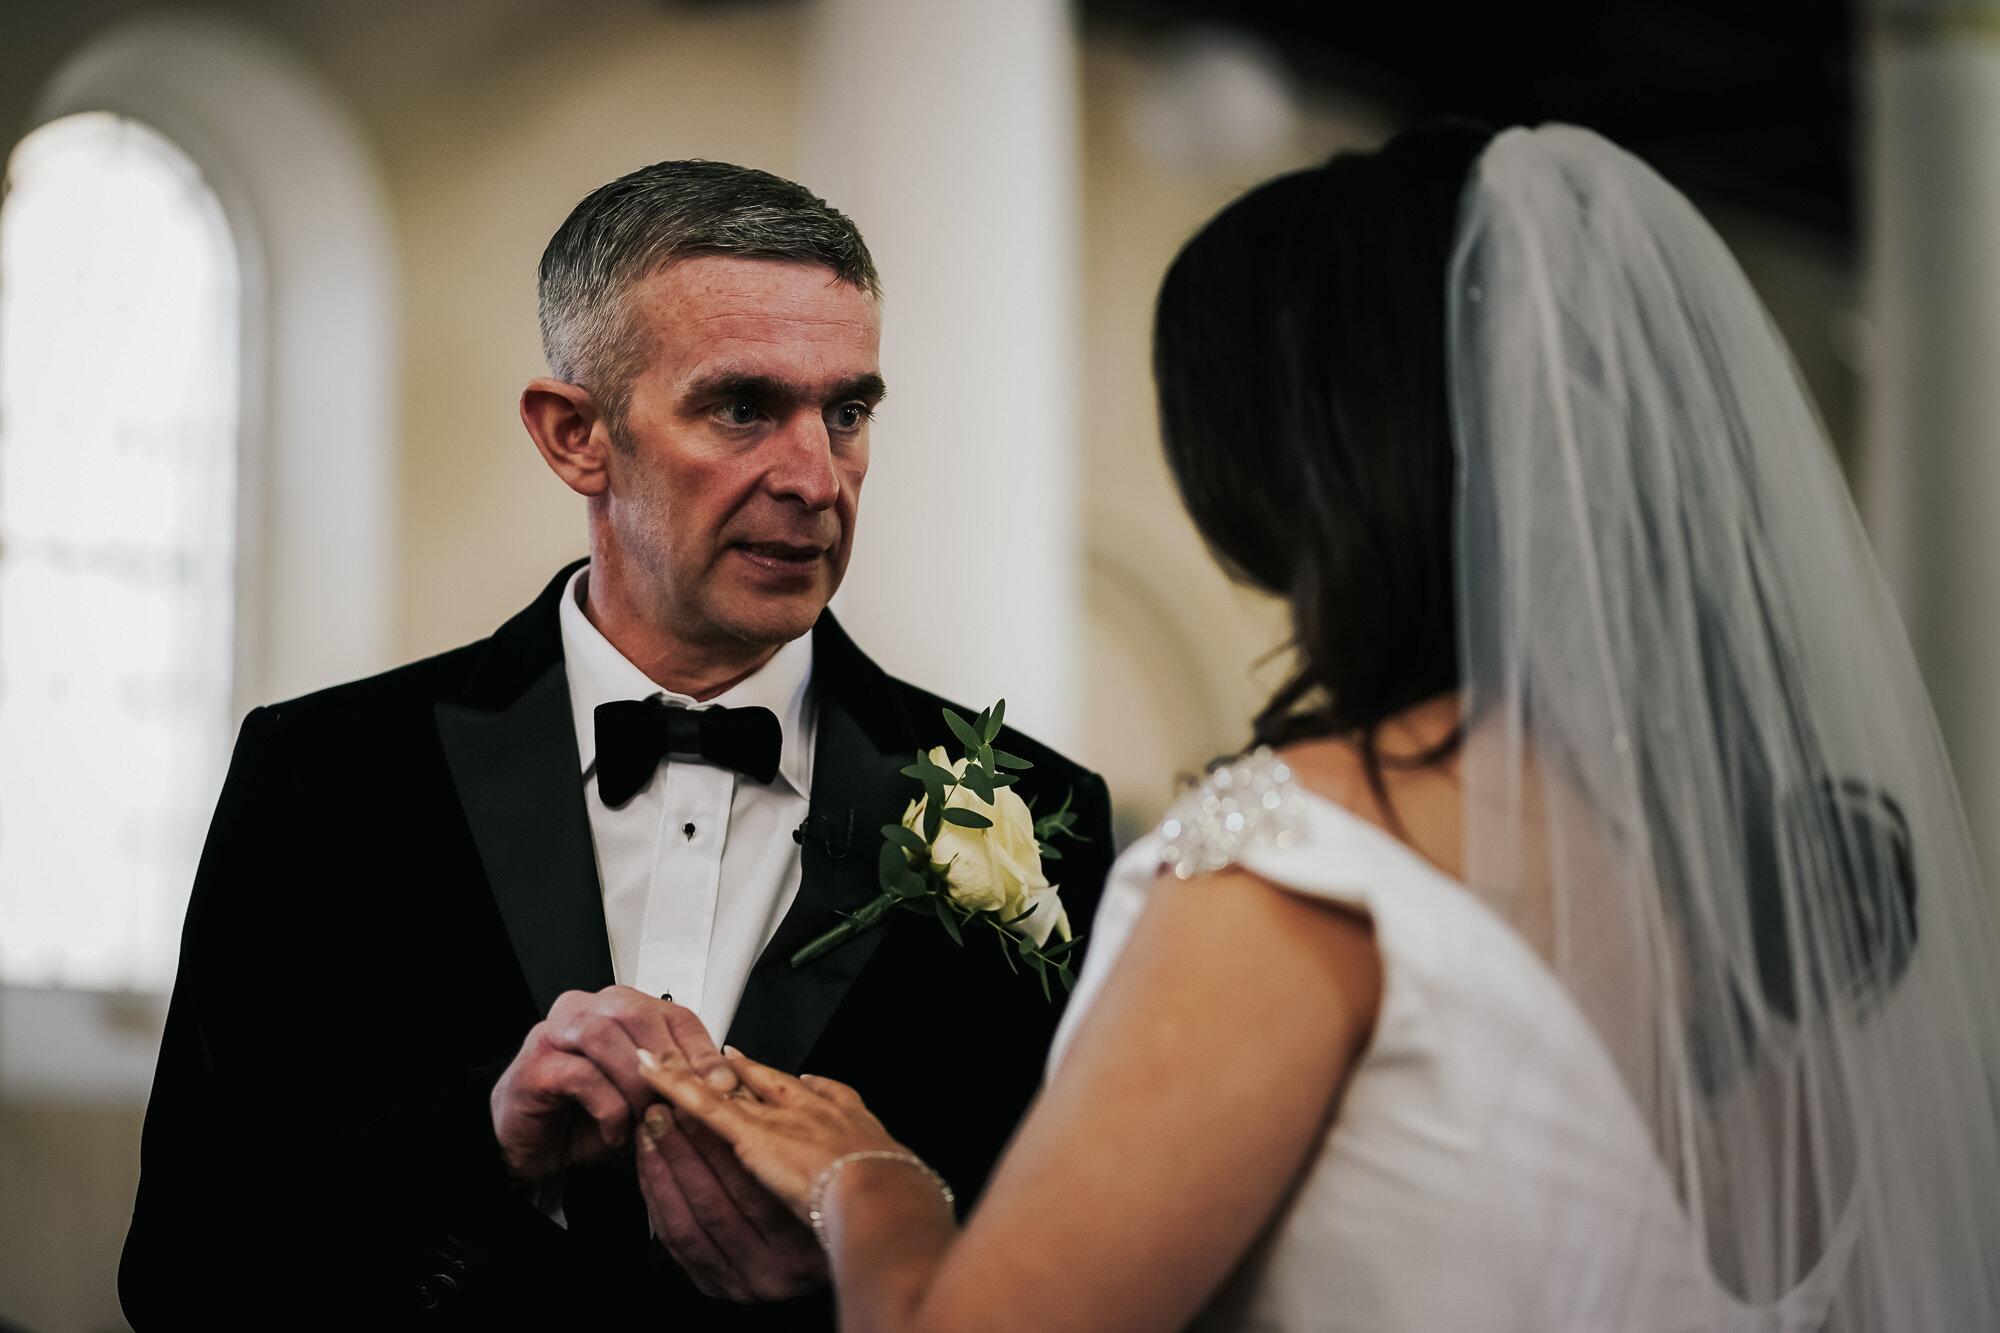 Clontarf Caste wedding photographer Wedding Photography dublin ireland wedding photographer (25 of 58).jpg